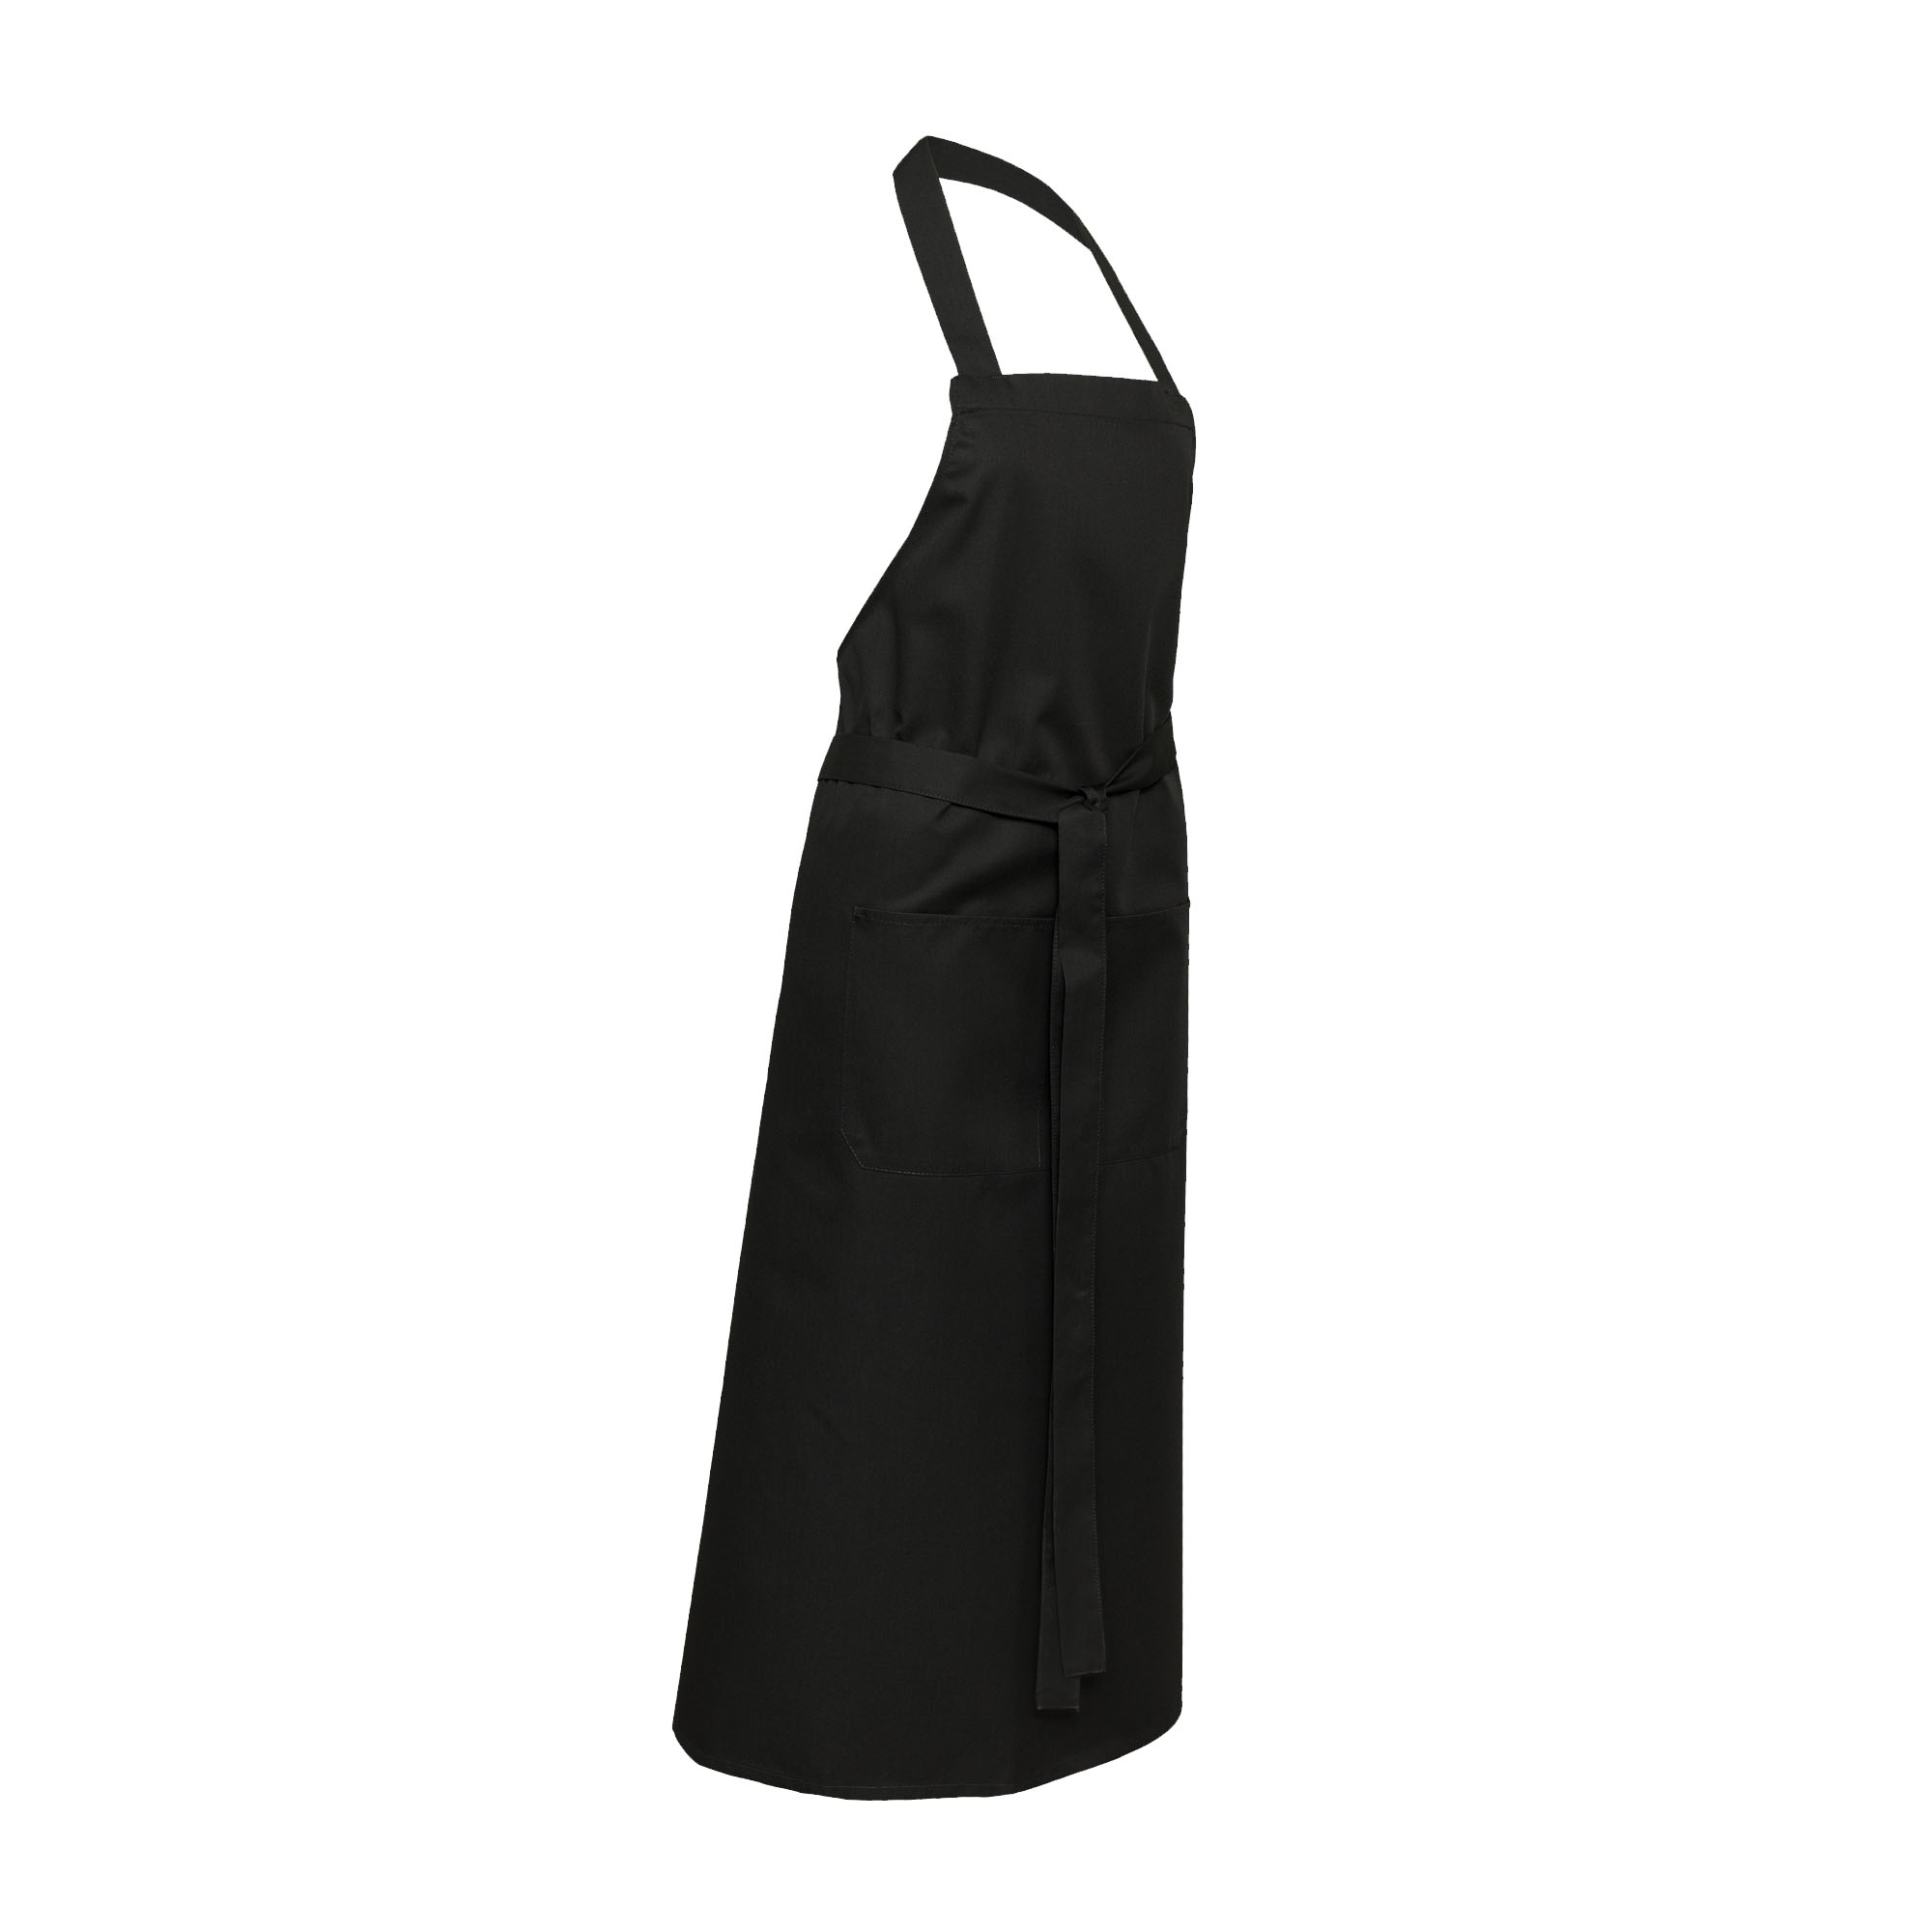 Latzschürze Black XL Modell, Tasche mittig